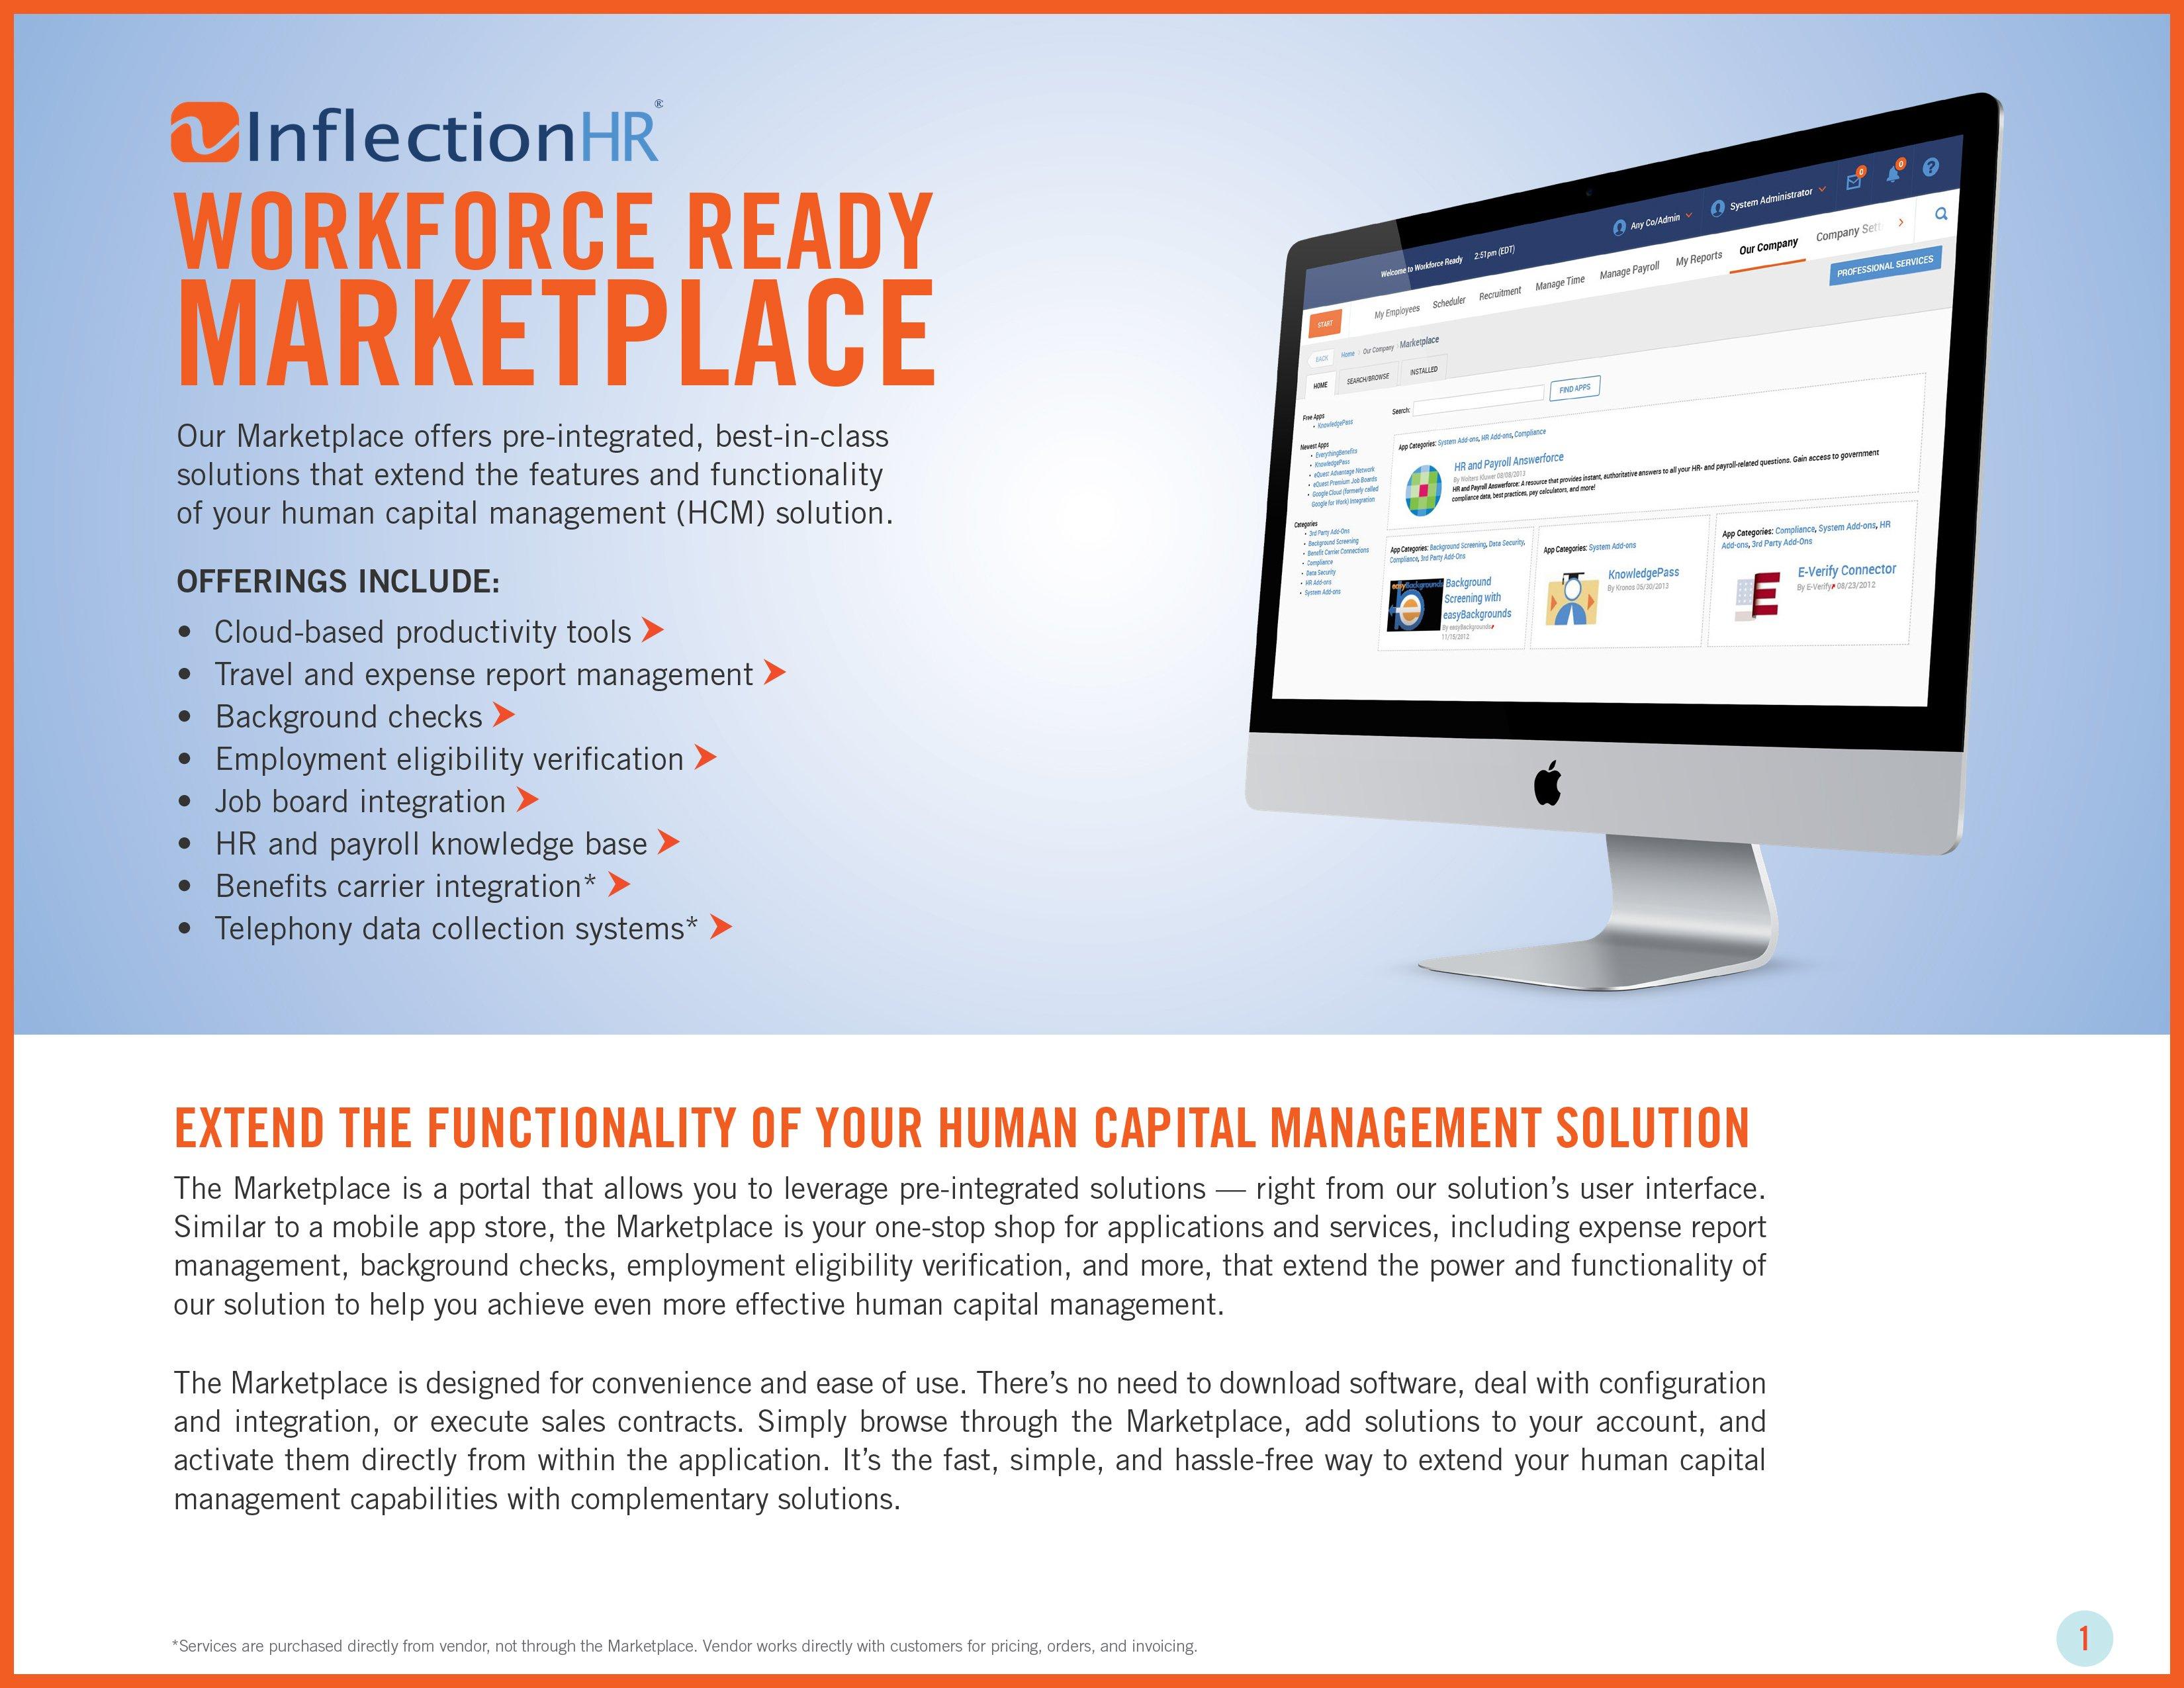 Workforce Ready Marketplace eBook